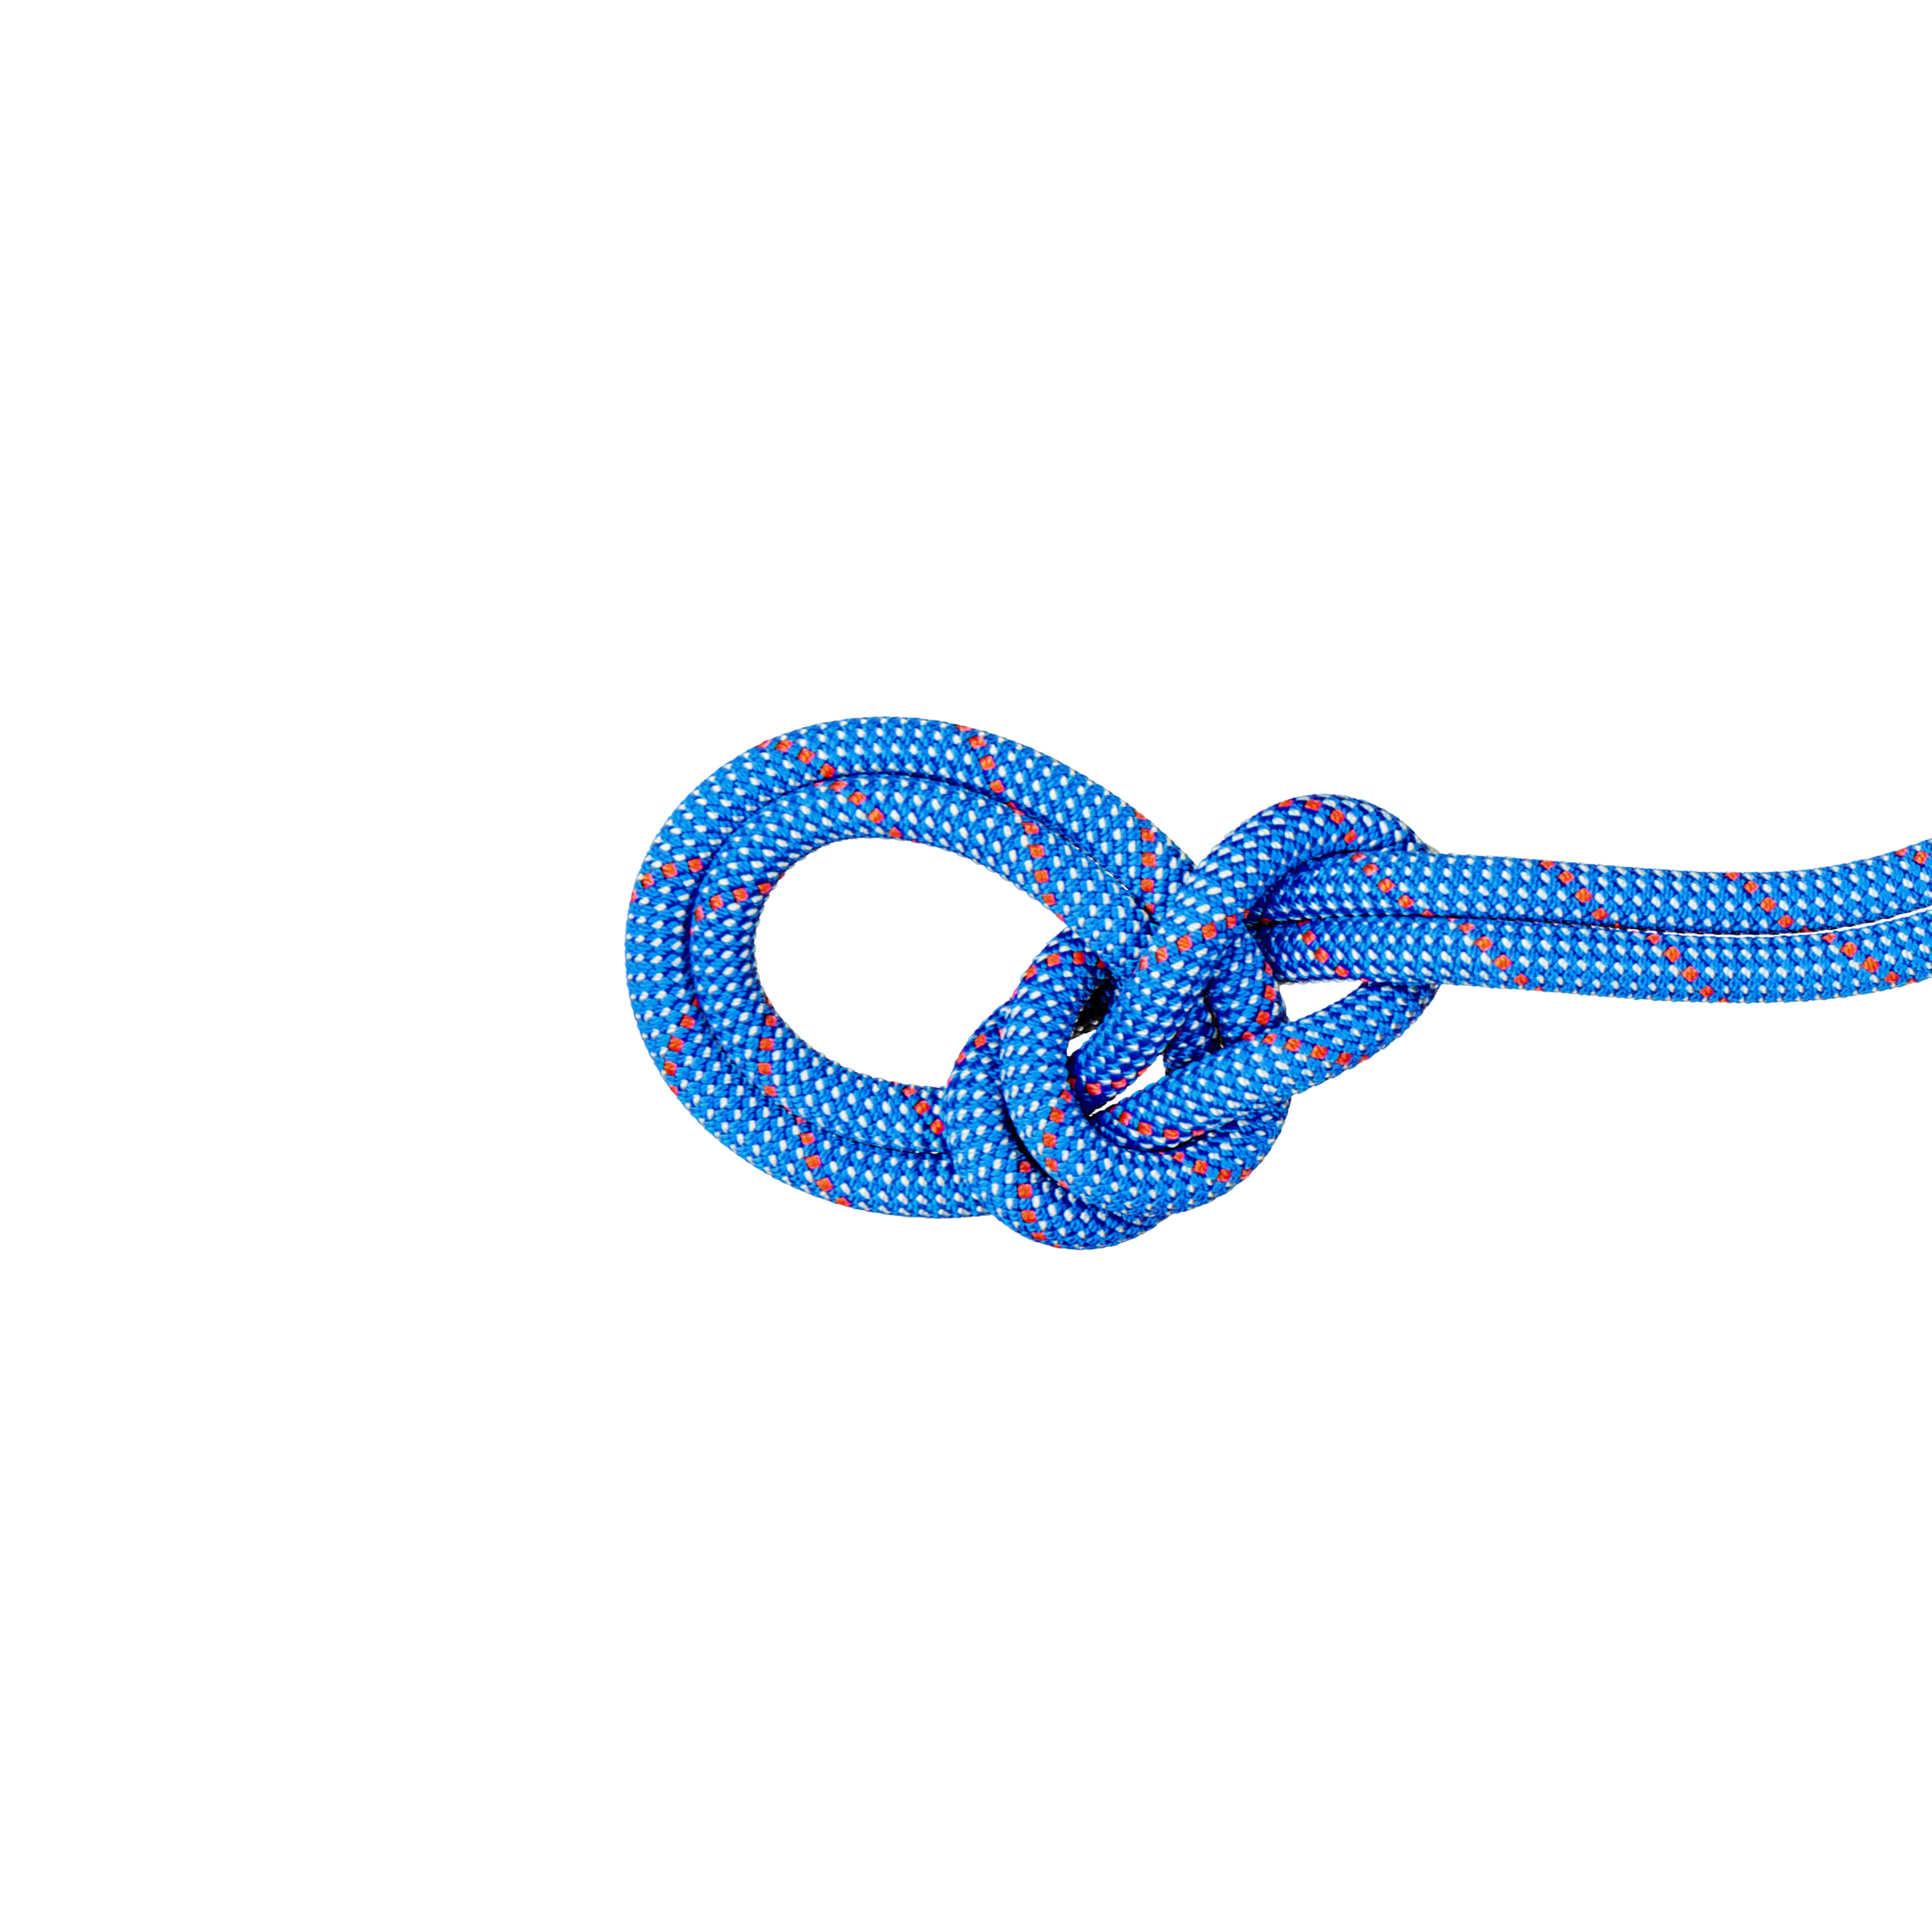 9.5 Crag Classic Rope - 50 m, Classic Standard, blue-white thumbnail